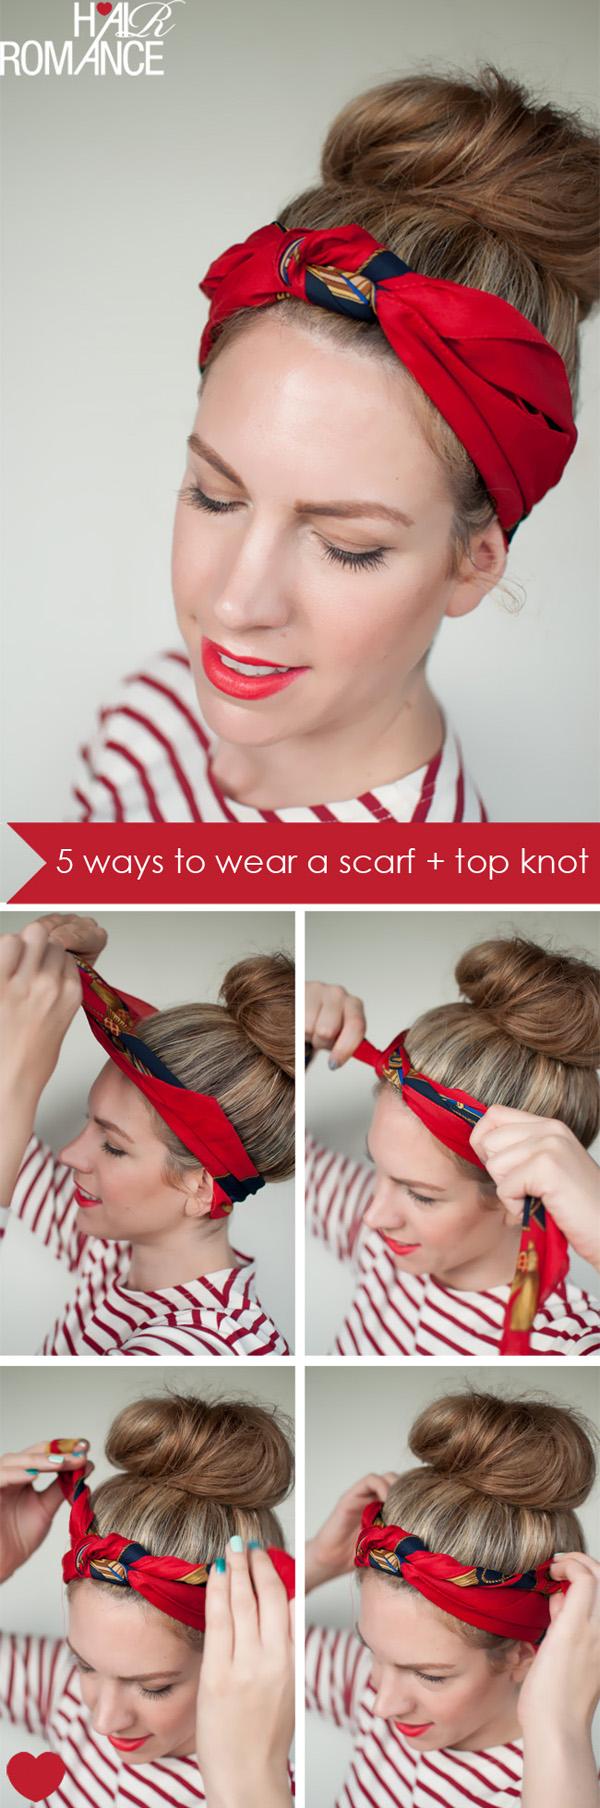 http://www.hairromance.com/wp-content/uploads/2012/04/5-ways-scarf-top-knot-hairstyle-headband-tutorial.jpg